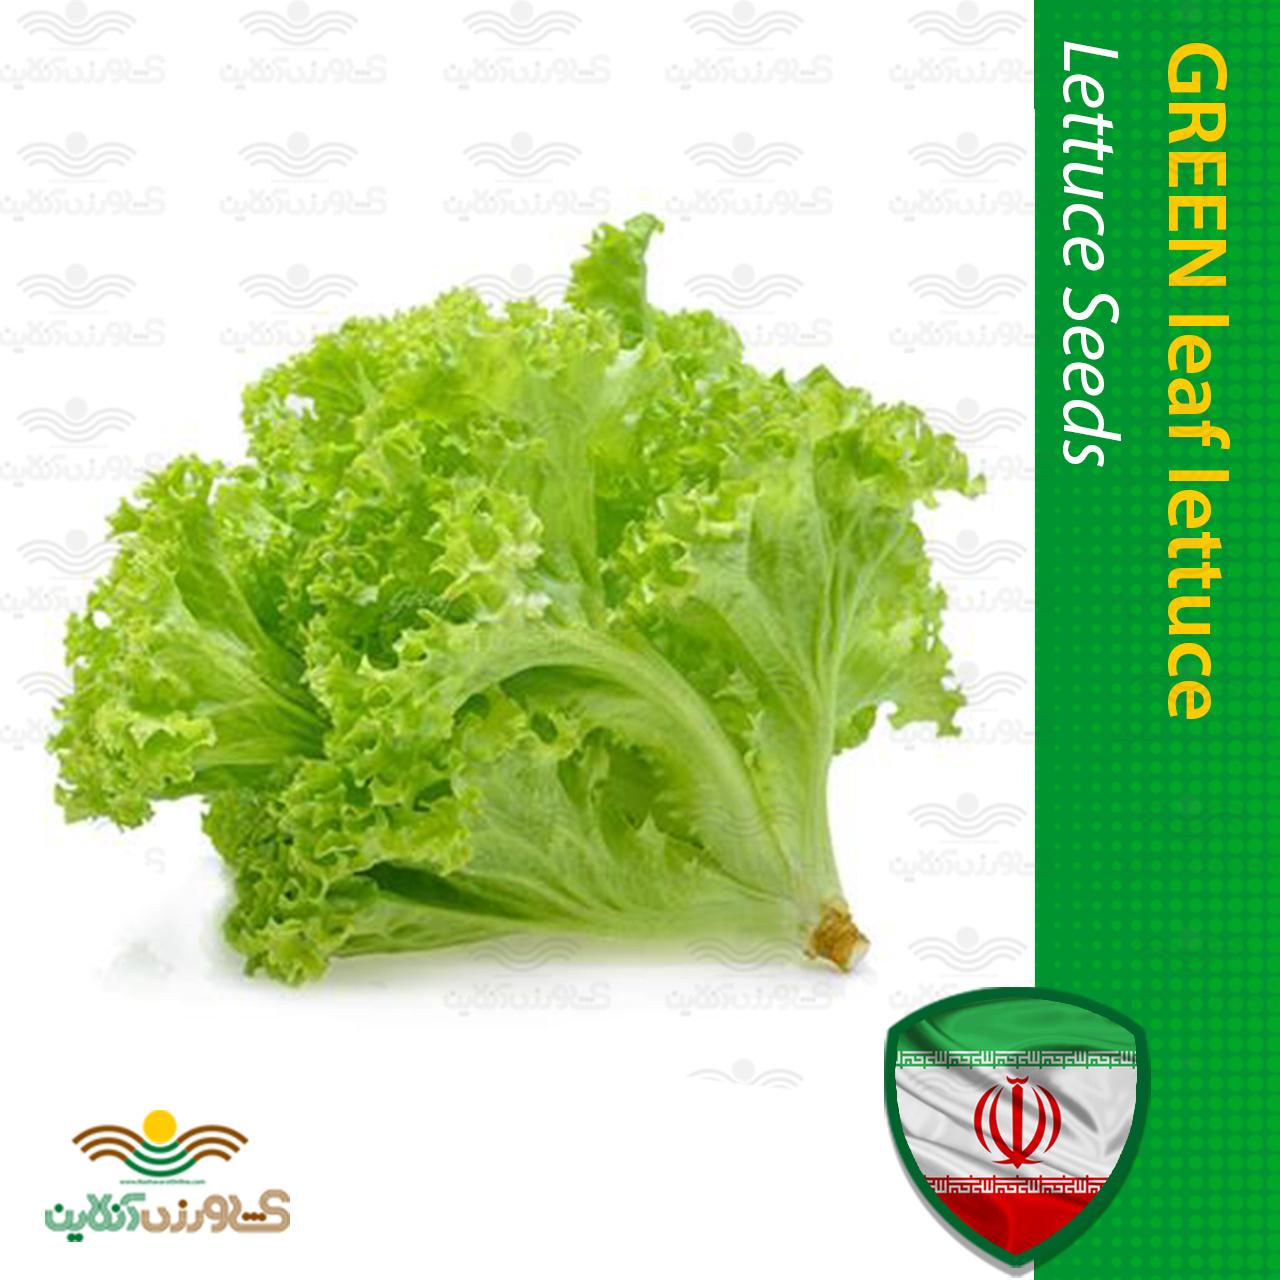 کاهو فرانسوی سبز و روش کاشت کاهو